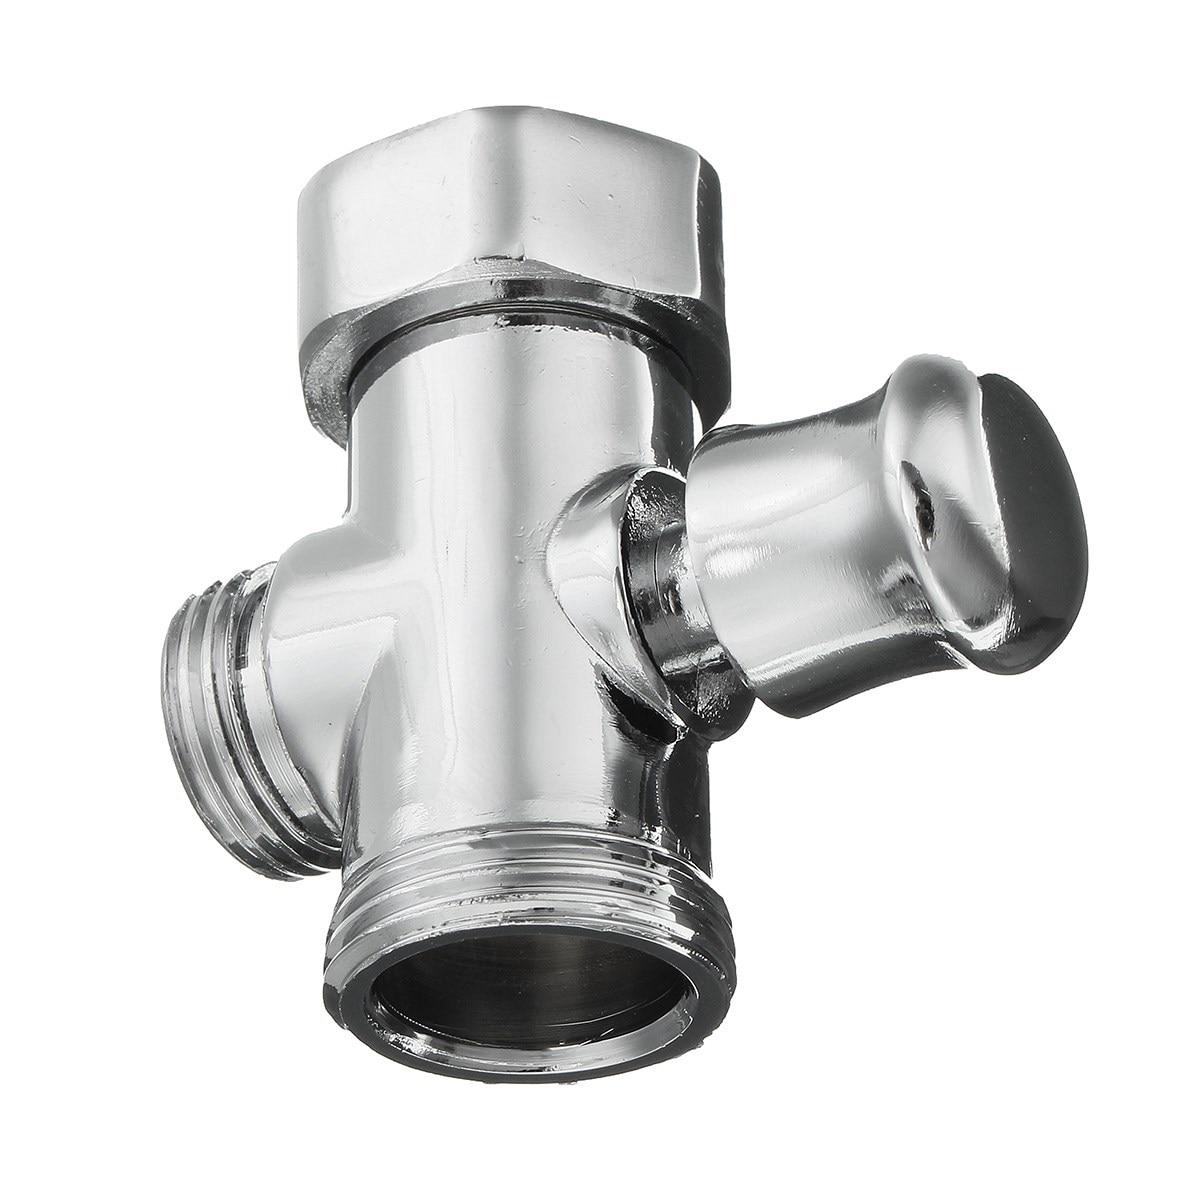 Bathroom Faucet Adapter popular faucet adapter kit-buy cheap faucet adapter kit lots from